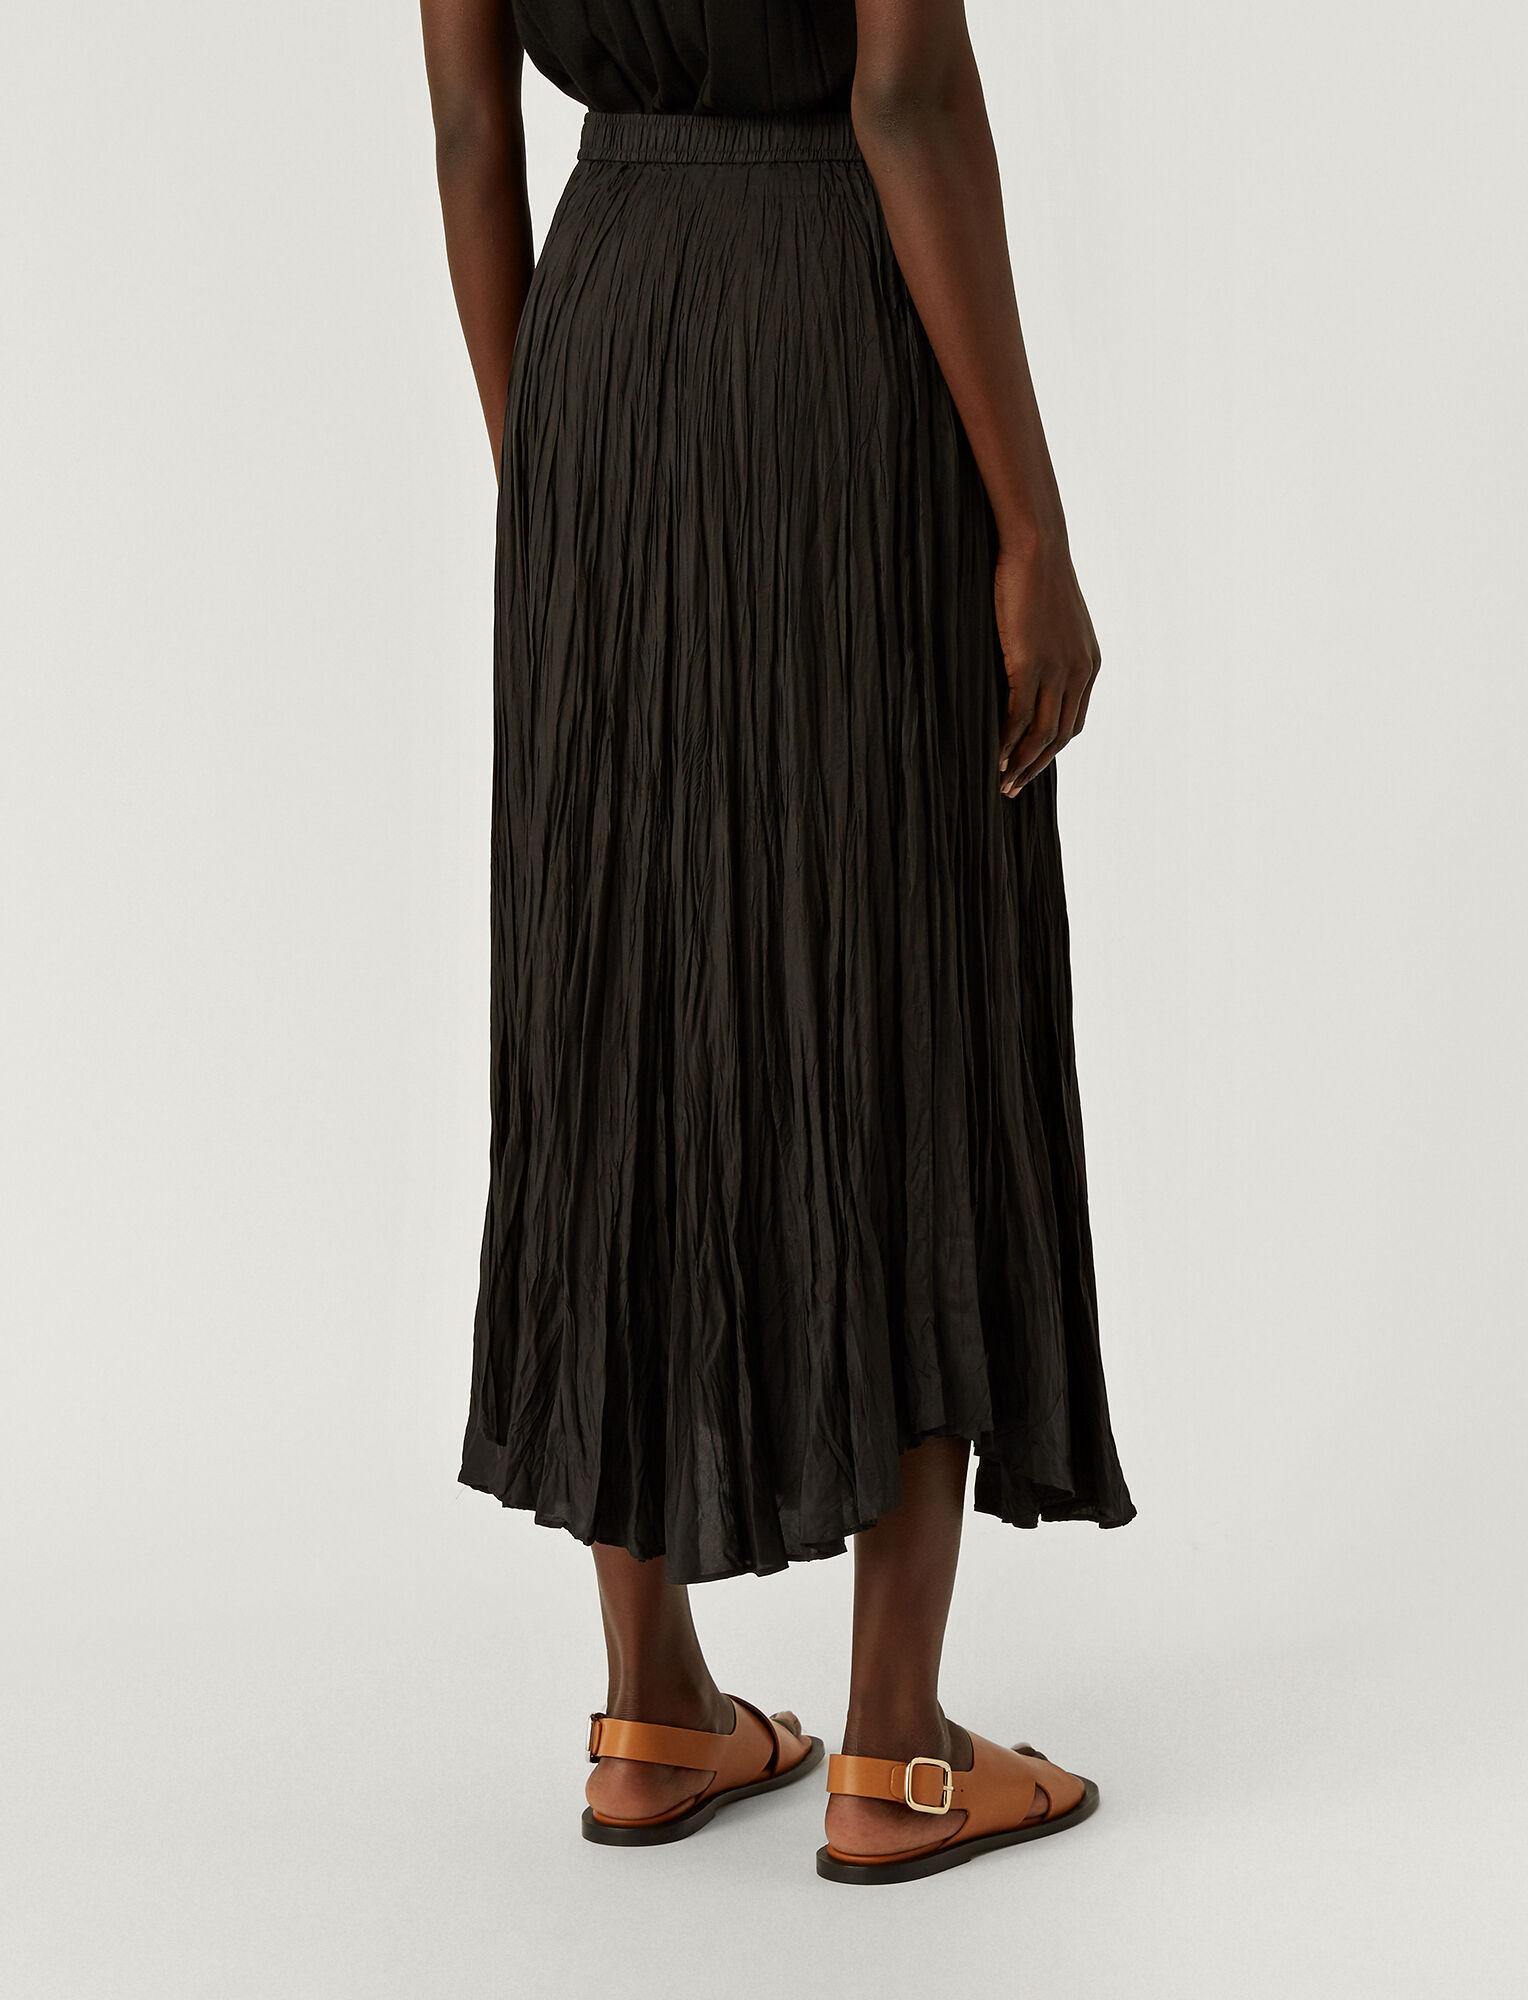 Joseph, Habotai Sully Skirt, in BLACK